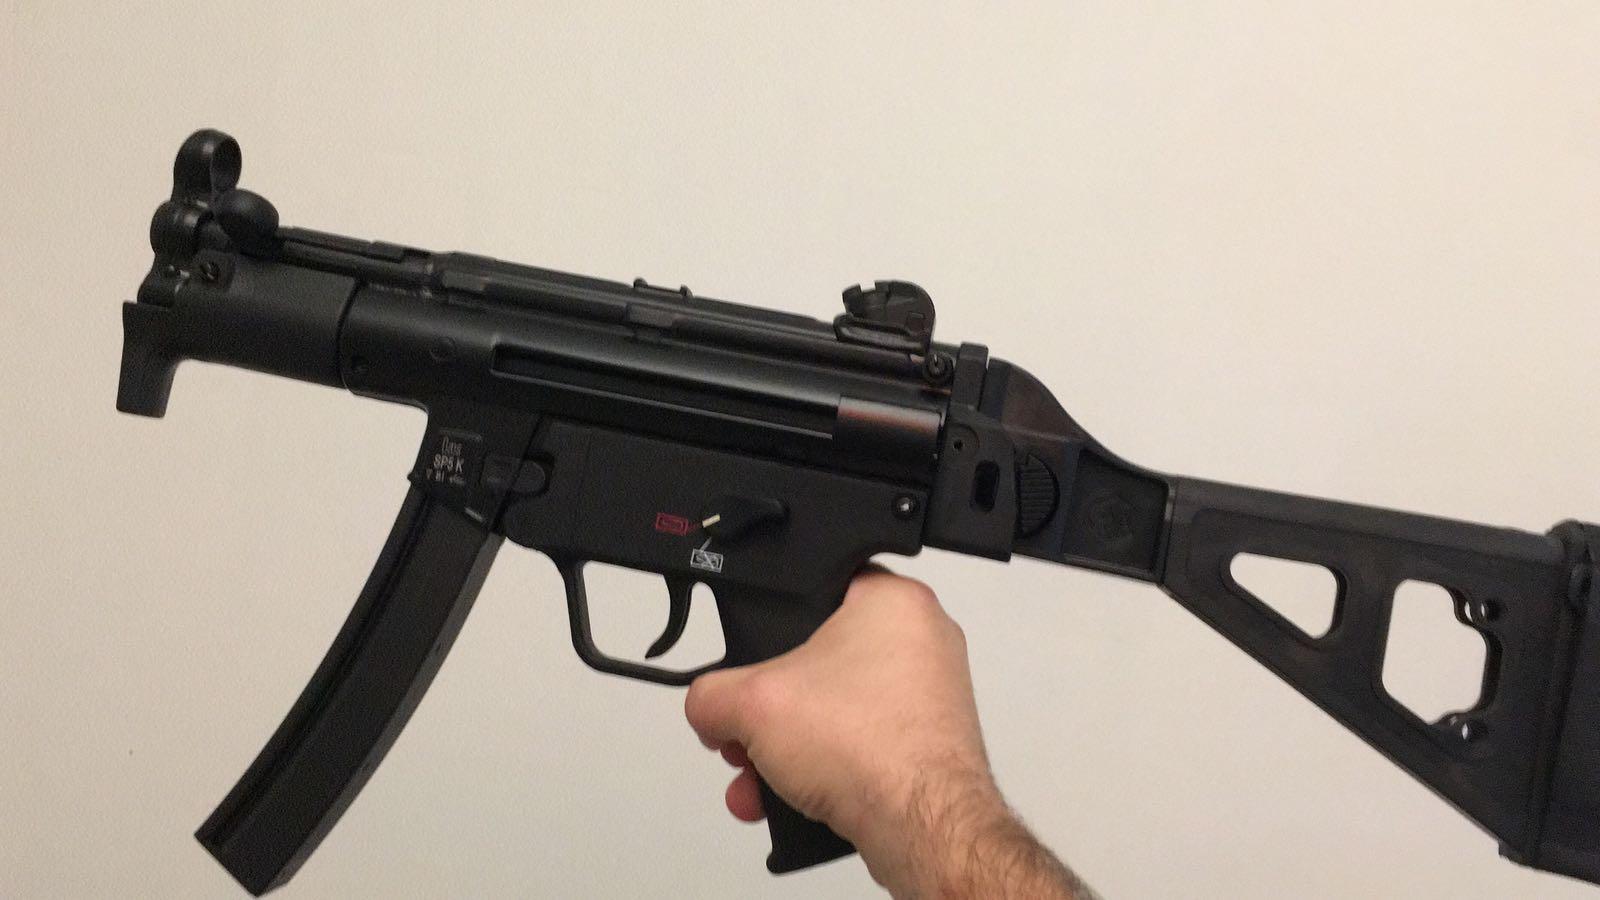 SP5K Pistol Brace-e3f8fc56-a1e0-4d24-80ab-1c5a3ef76914_1564655584640.jpeg